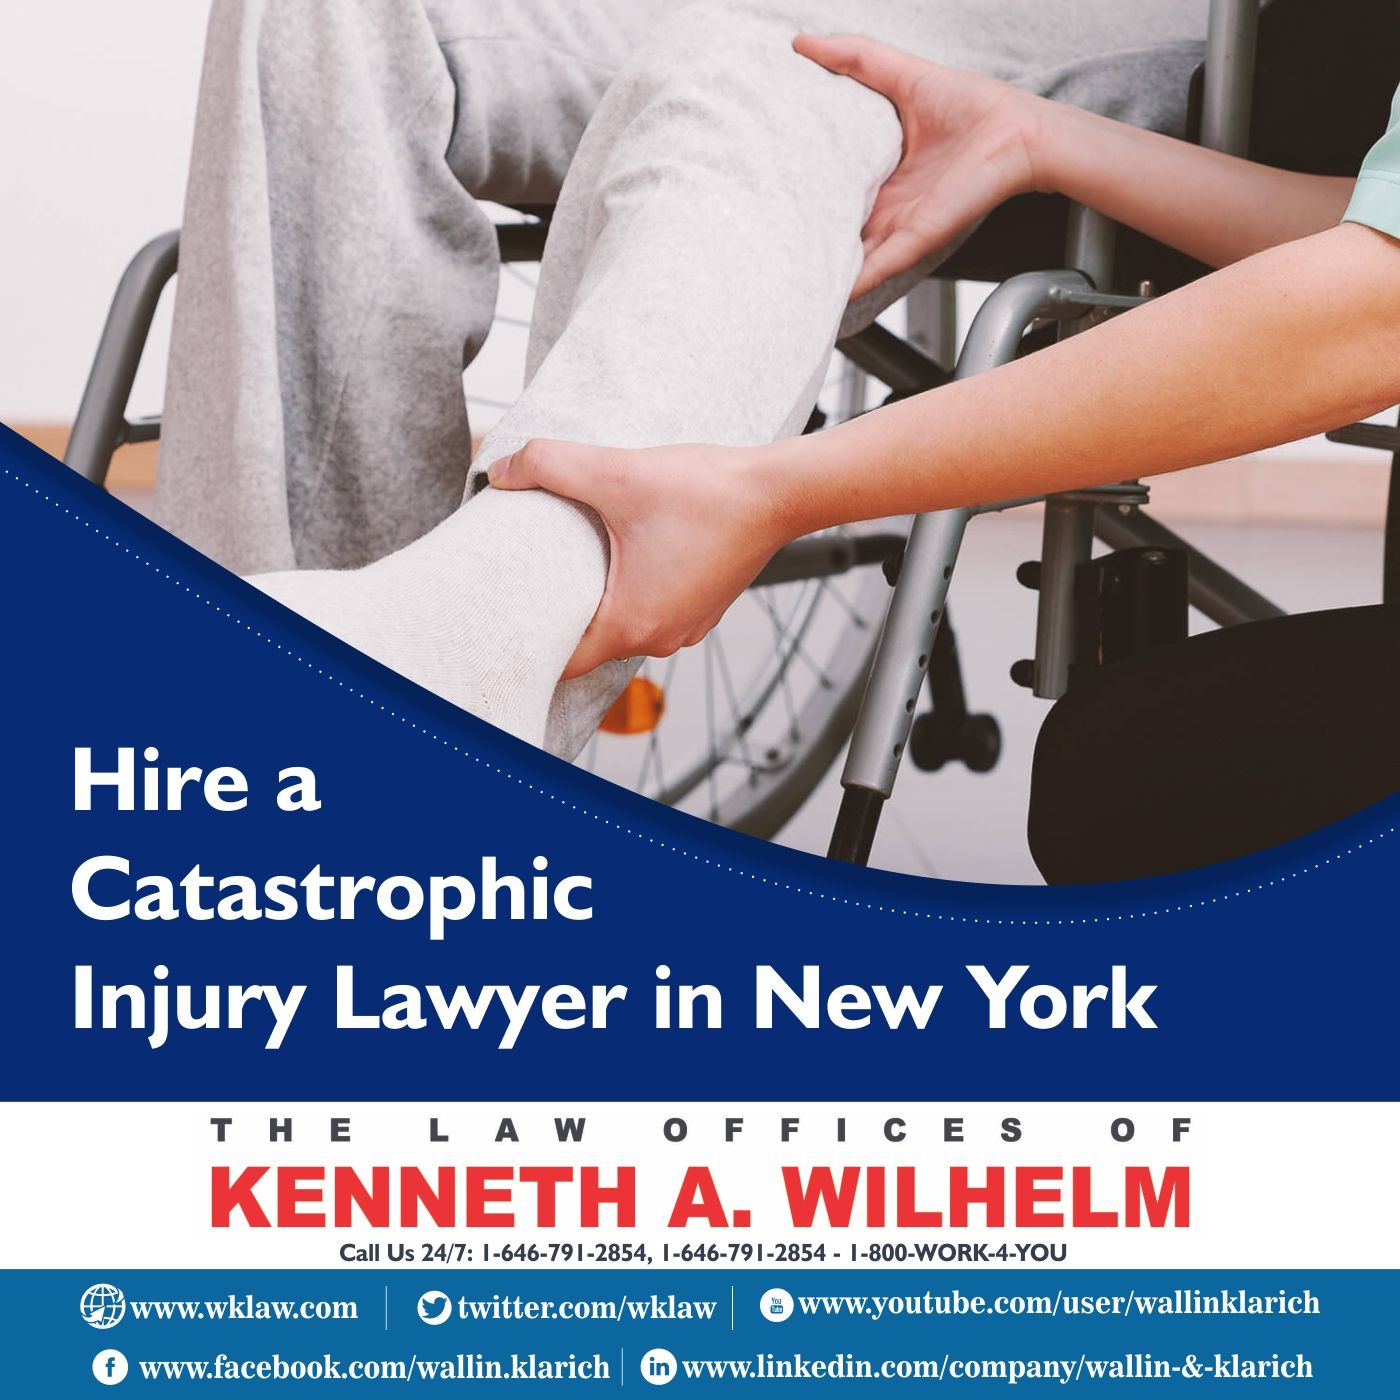 New York Catastrophic Injury Lawyer Injury Lawyer Injury